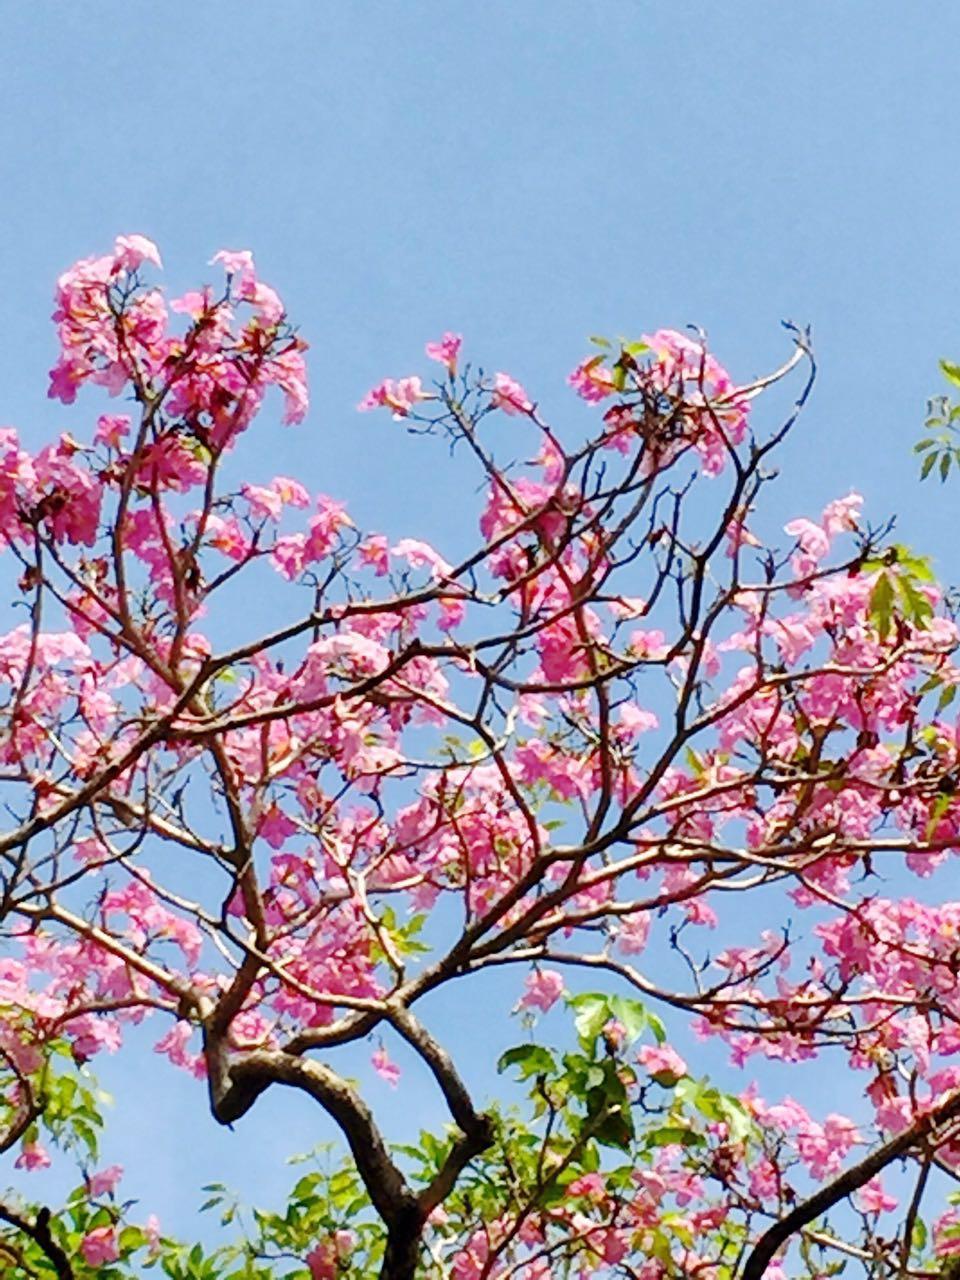 1. pink Tecoma blossoms